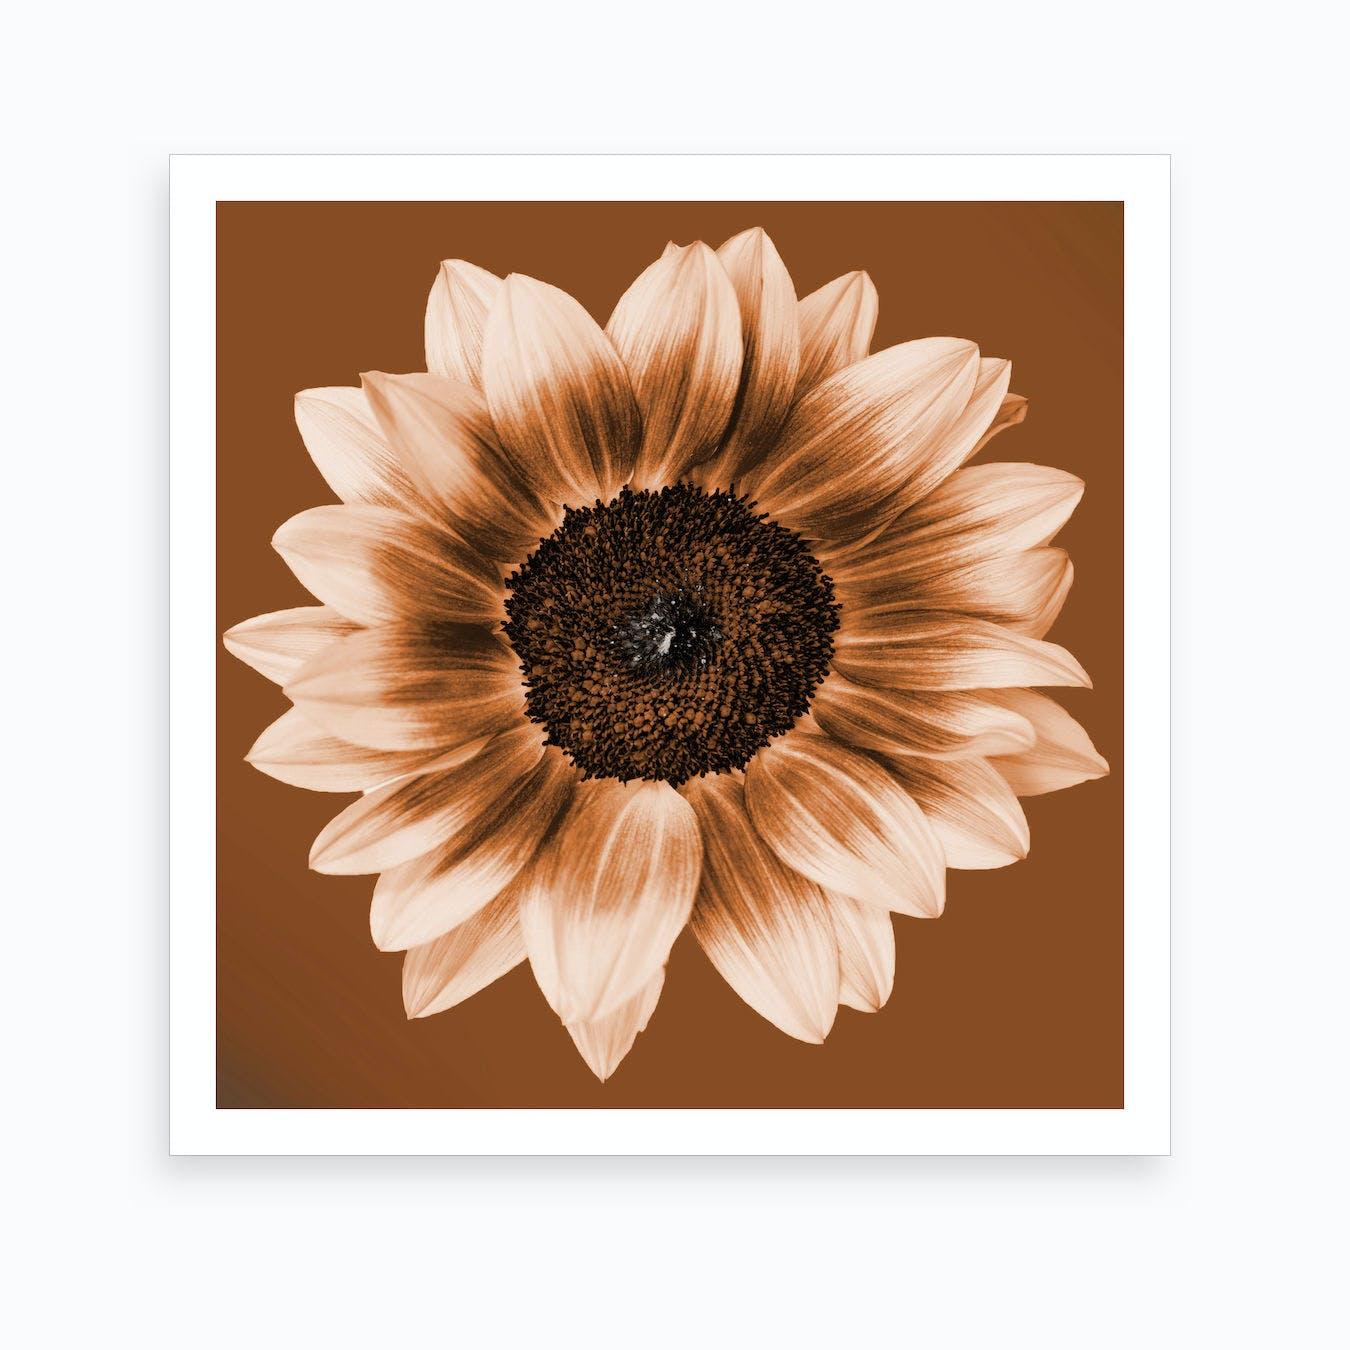 Rustic Sunflower Square Art Print